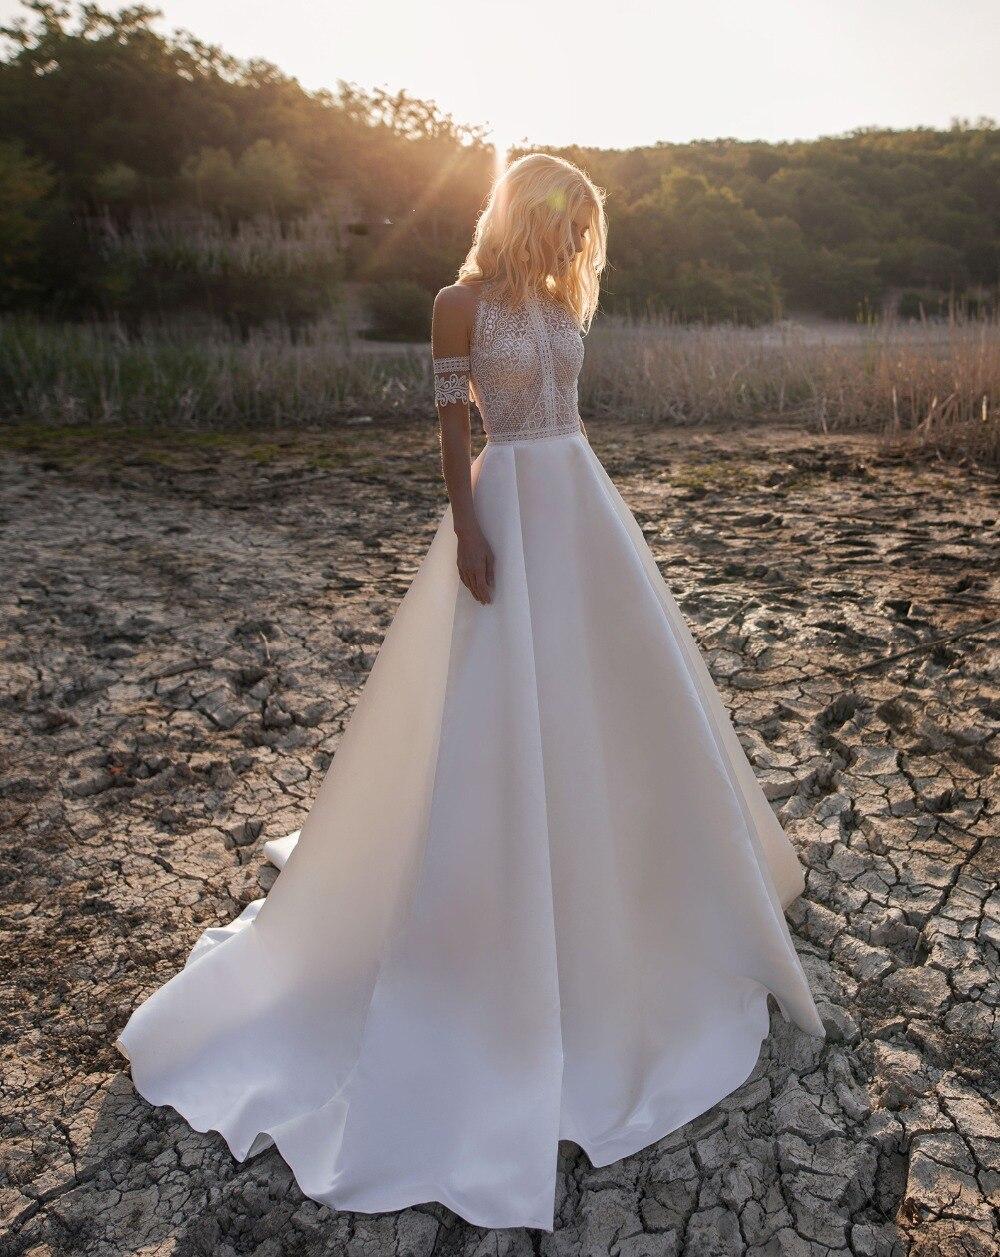 Big SaleûRobe-De-Mariee Bridal-Dress Wedding-Gowns Satin Lace A-Line Country-Style Sheer Boho